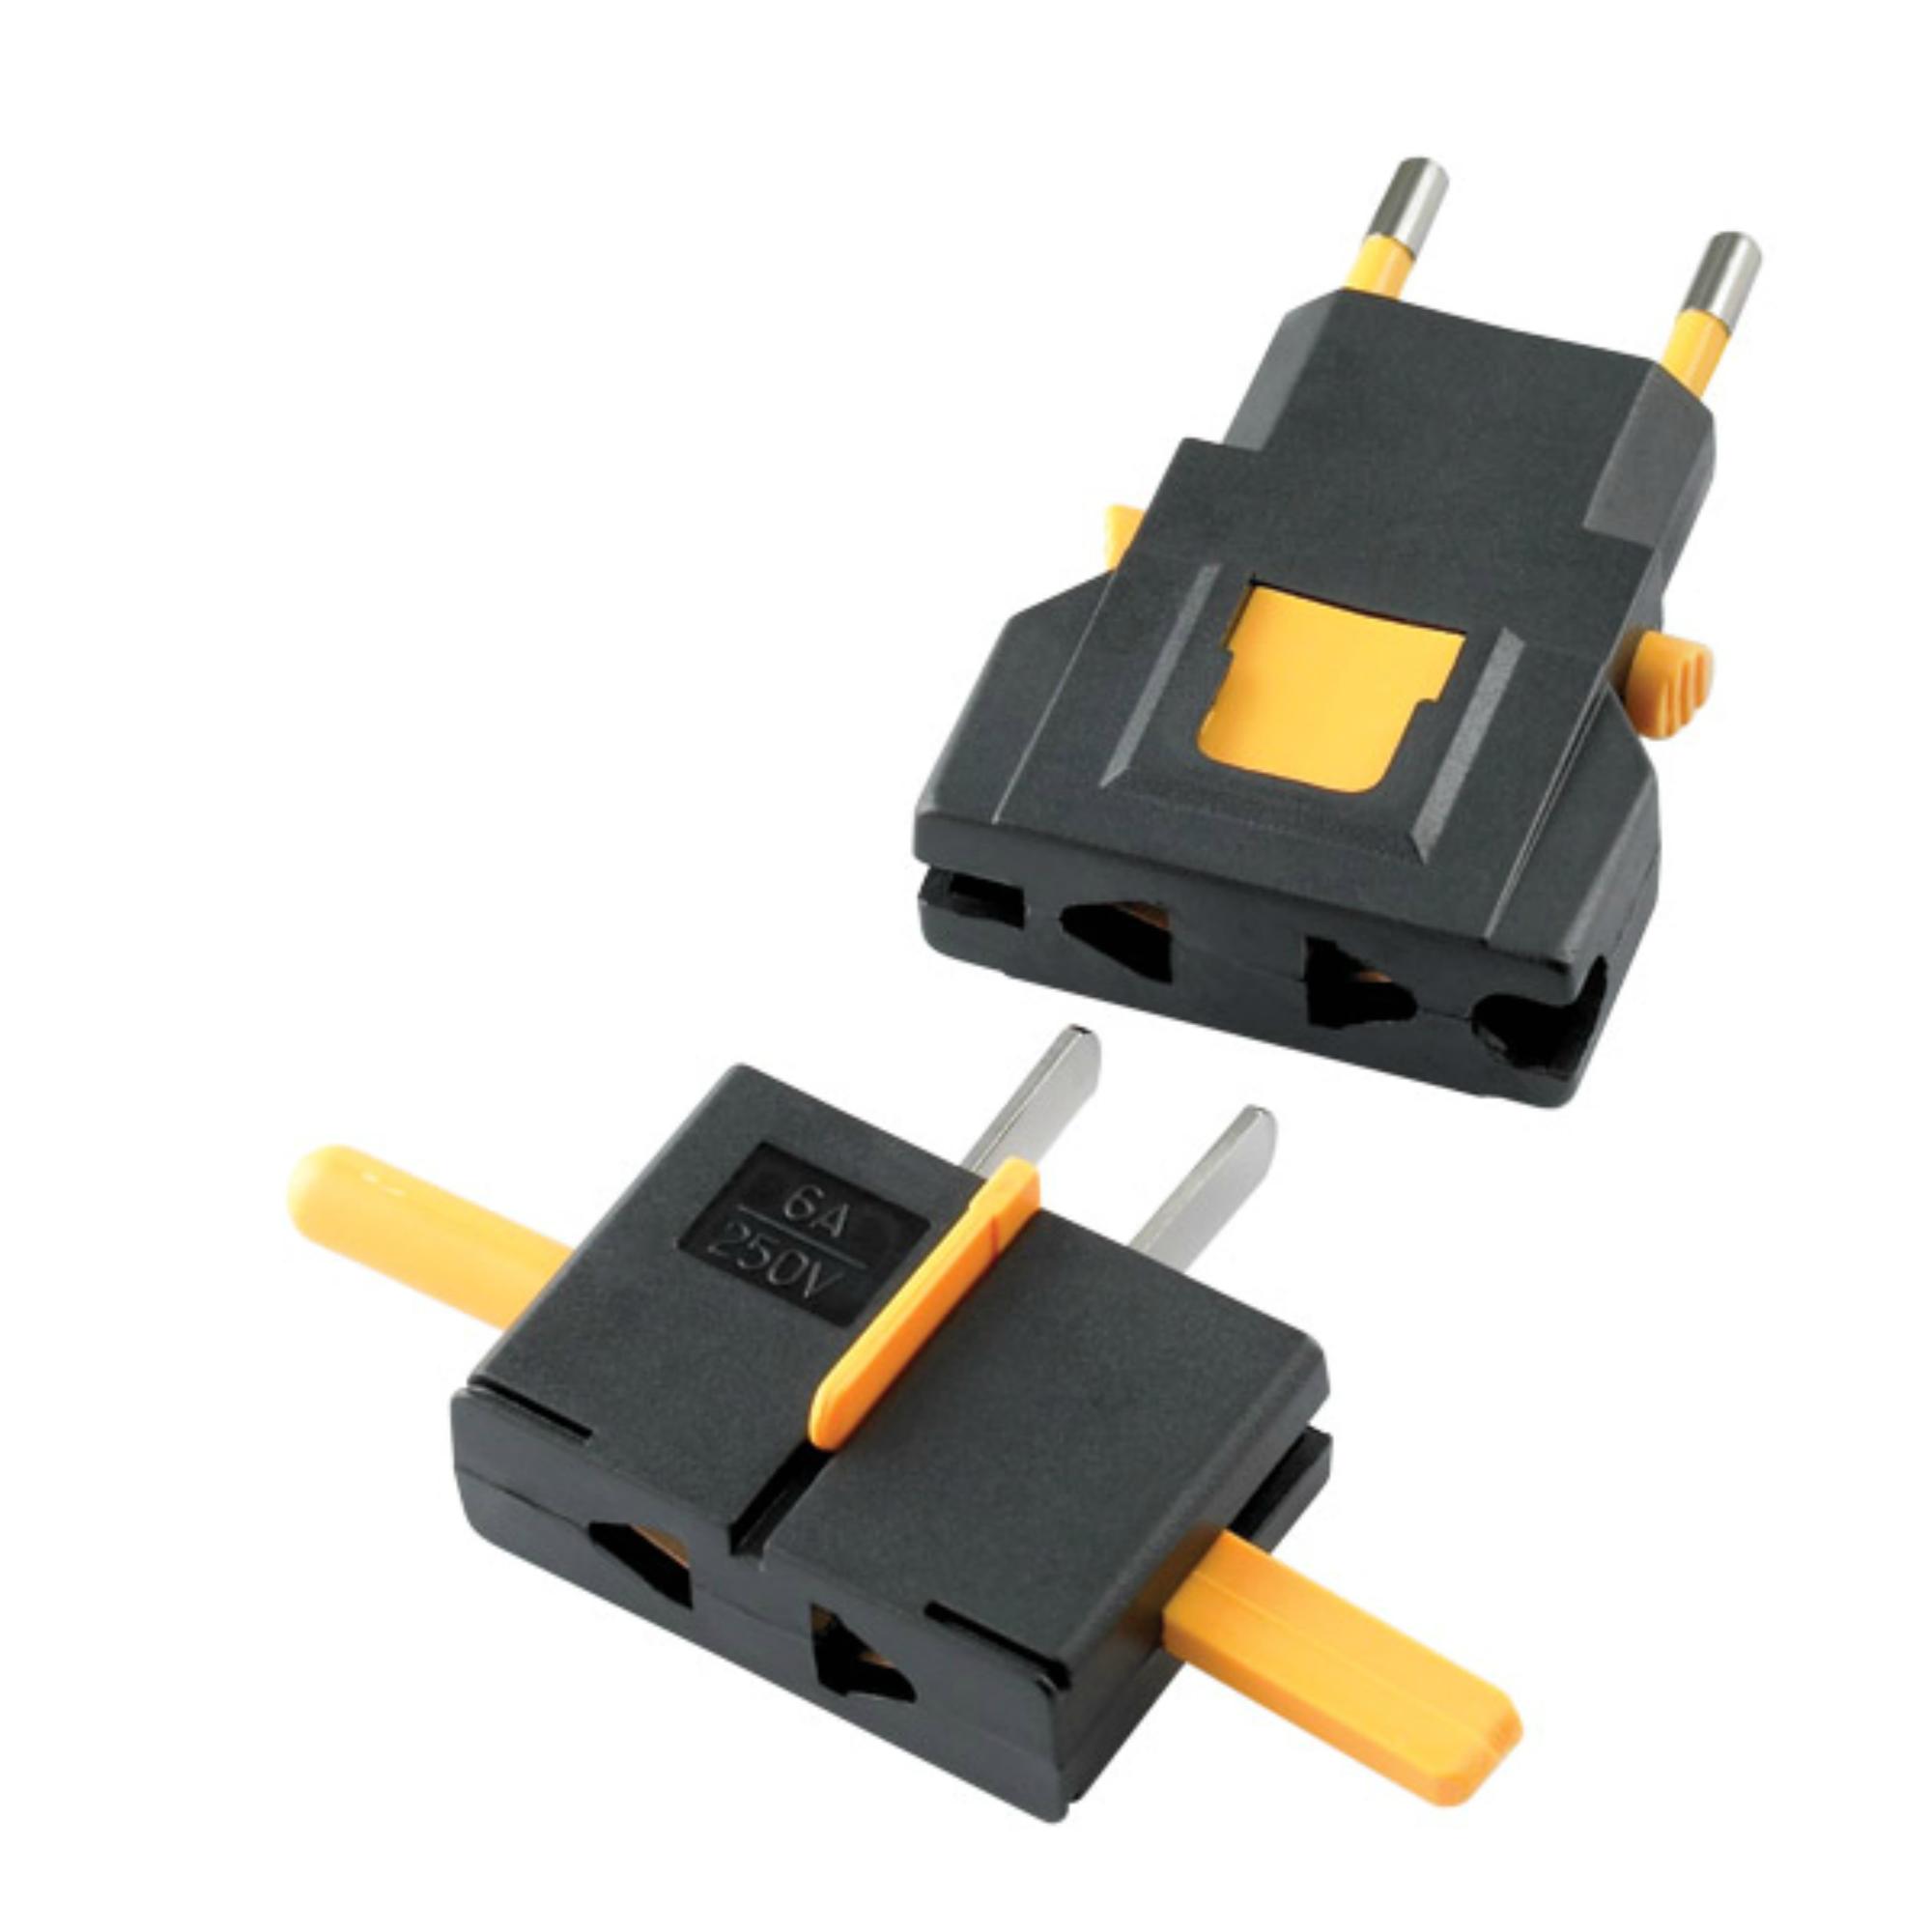 Designapplause Universal Power Adapter Kikkerland